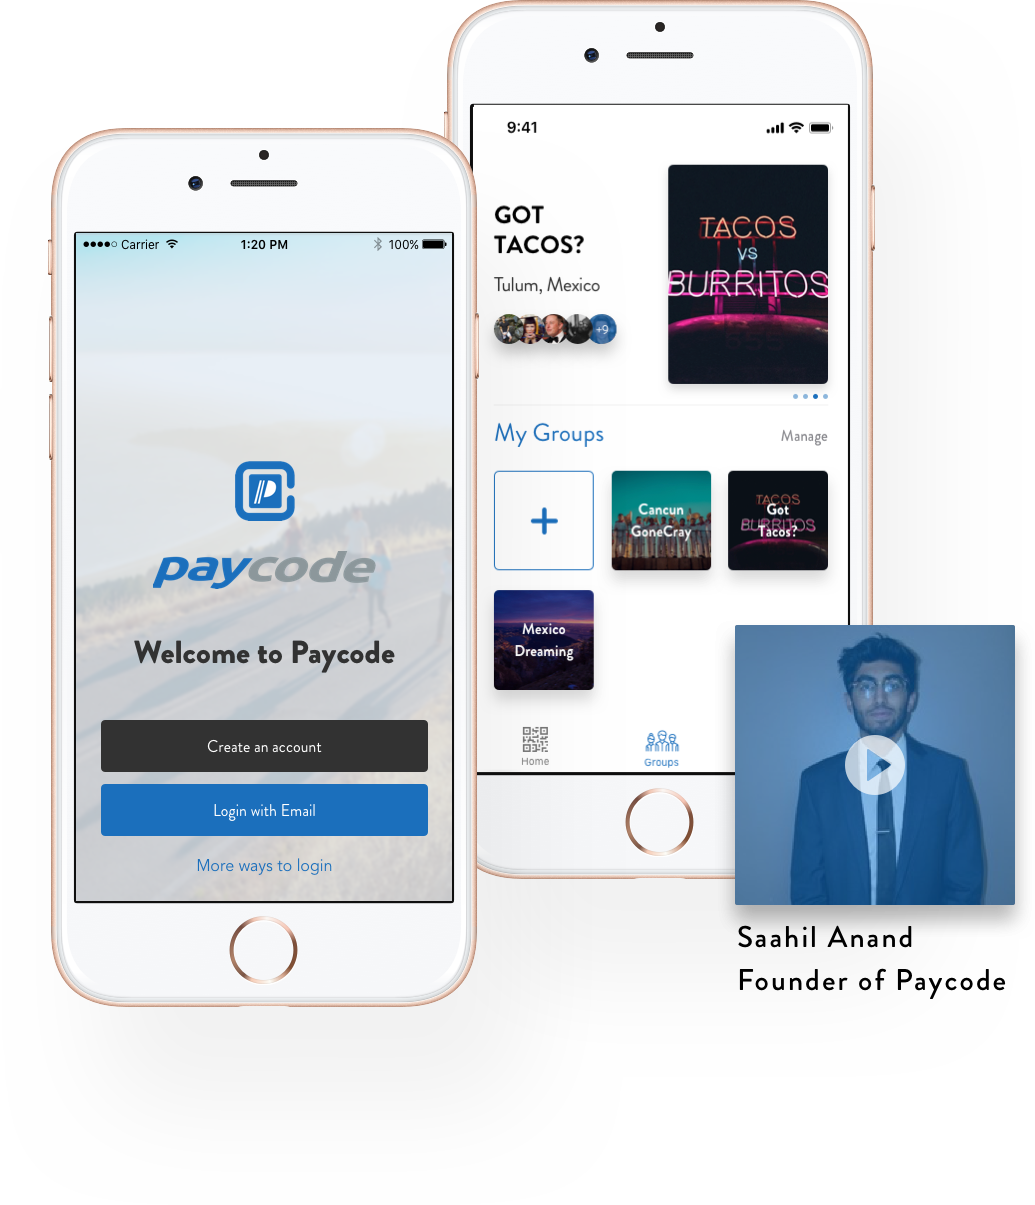 Paycode [lightbox]